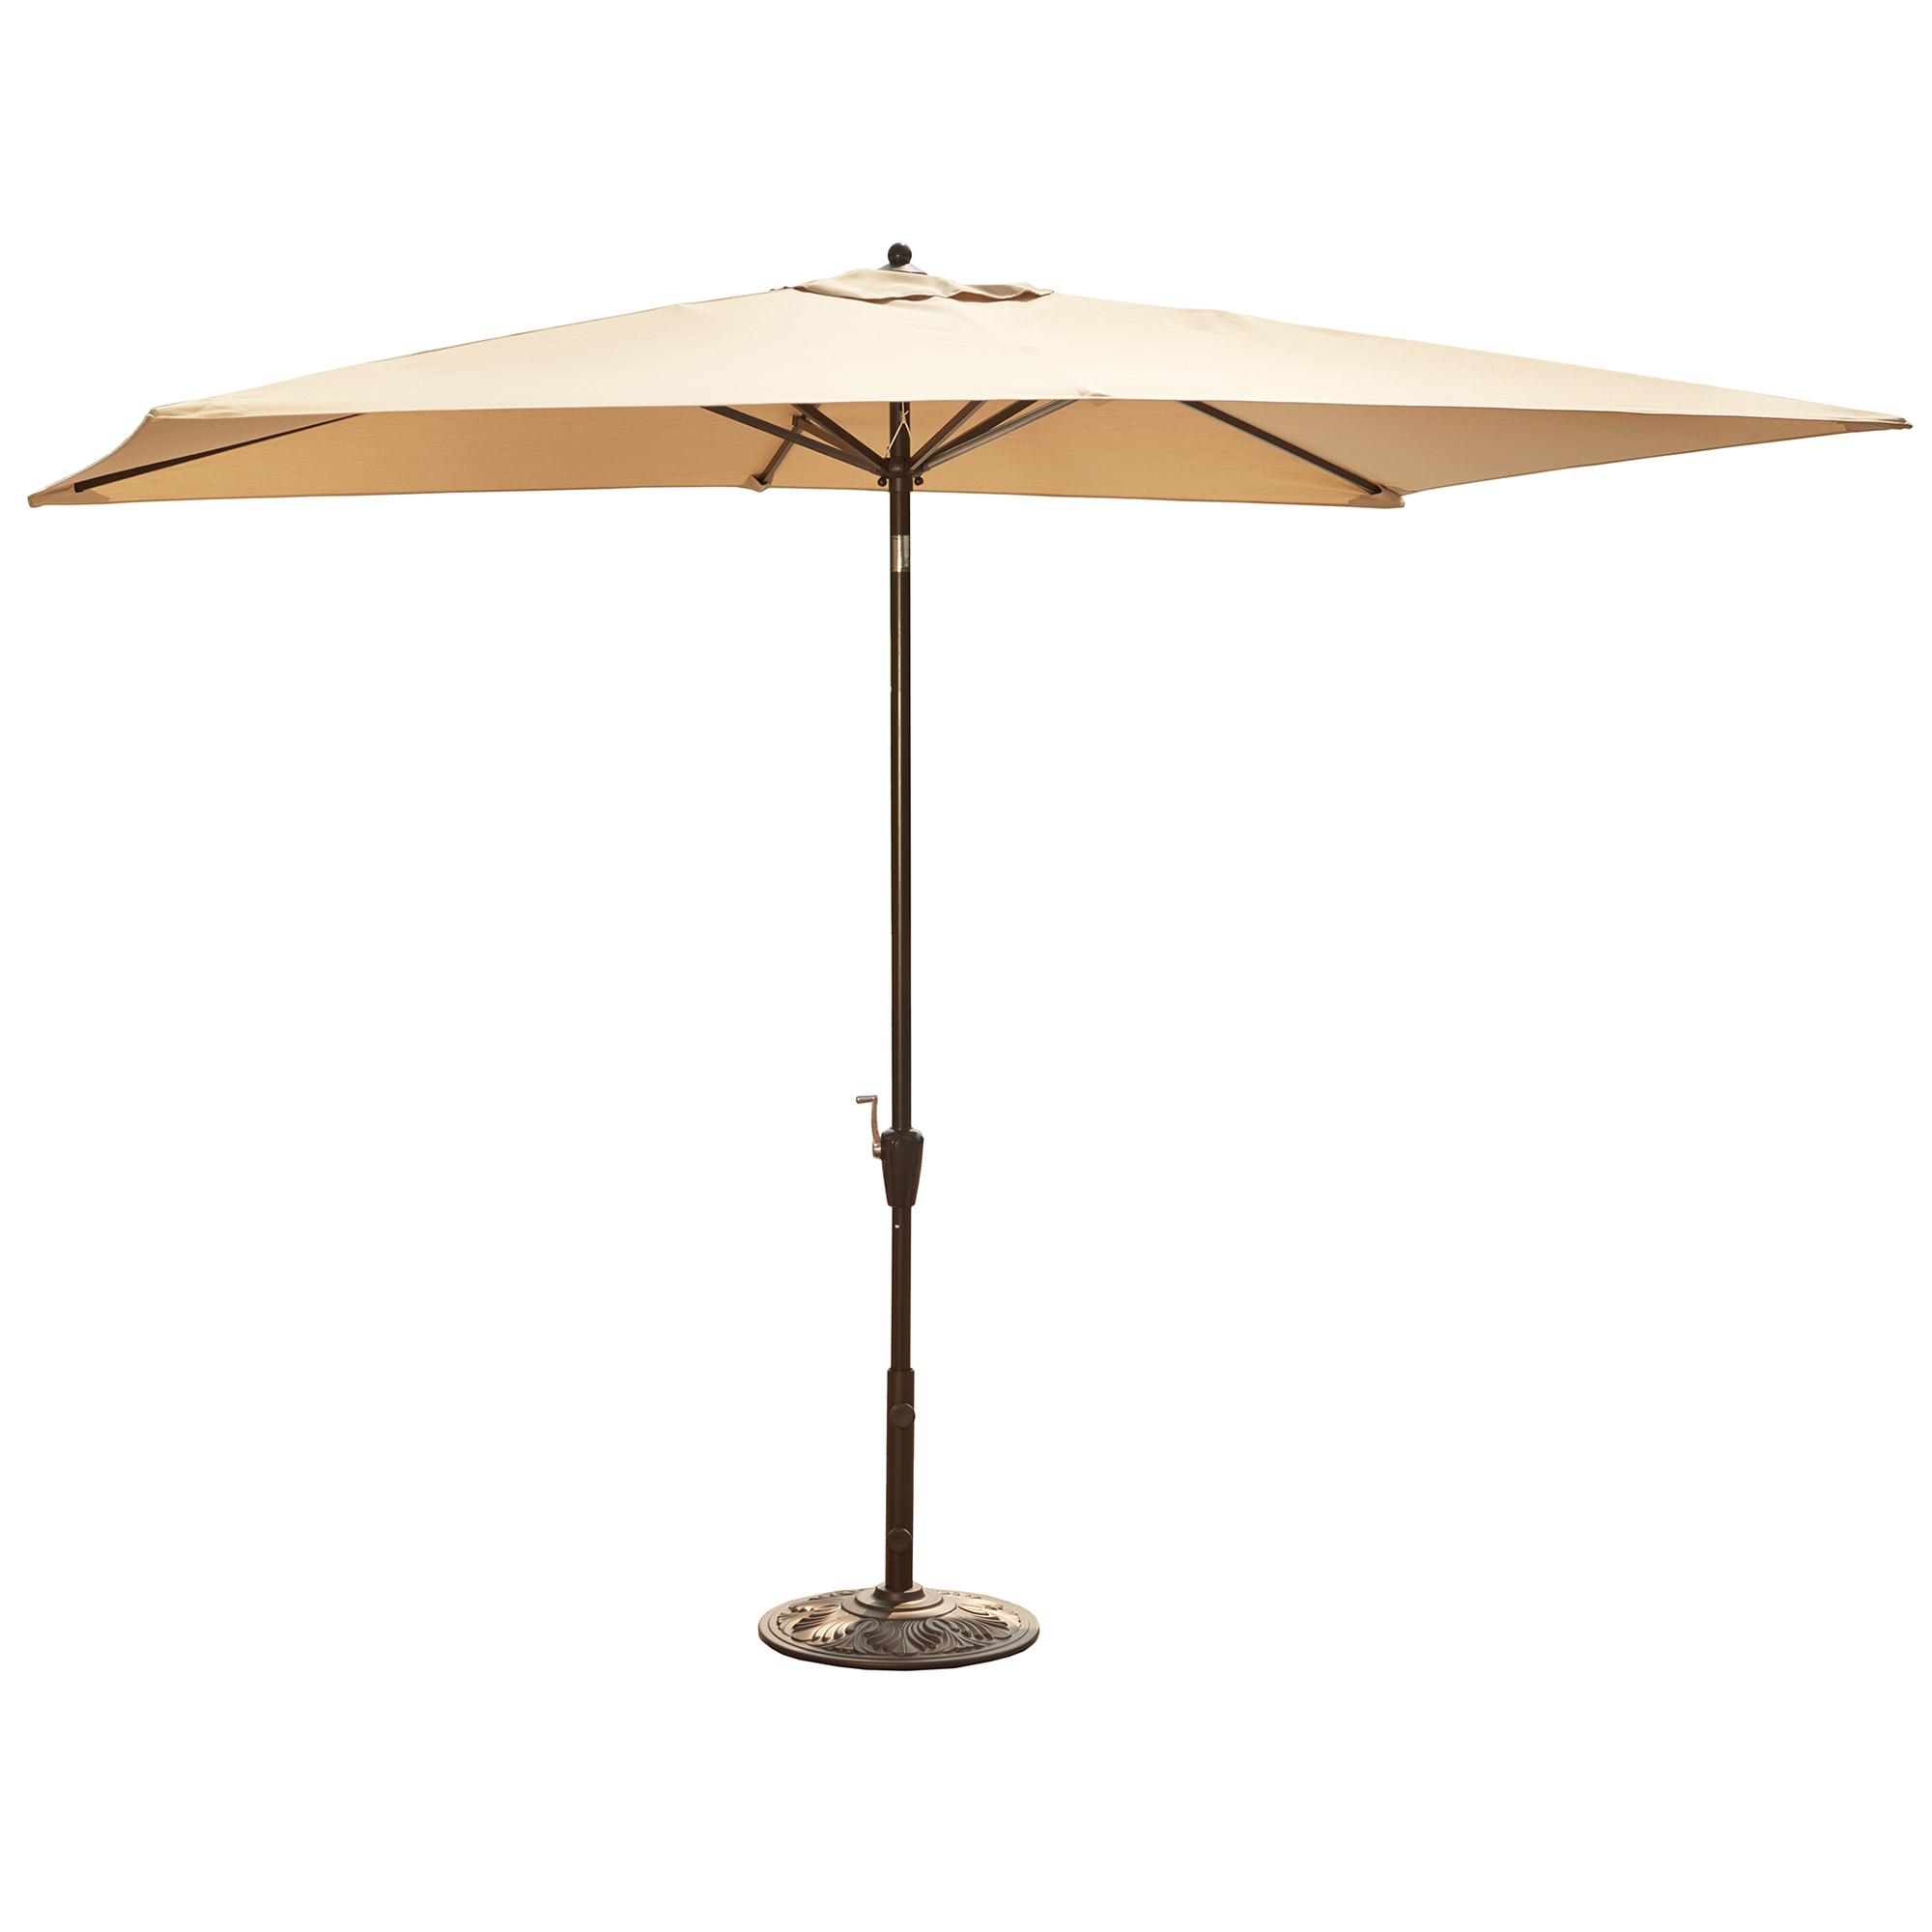 Island Umbrella Adriatic 6.5 Ft X 10 Ft Rectangular Market Umbrella In Beige Sunbrella Acrylic Within Widely Used Market Umbrellas (Gallery 15 of 20)